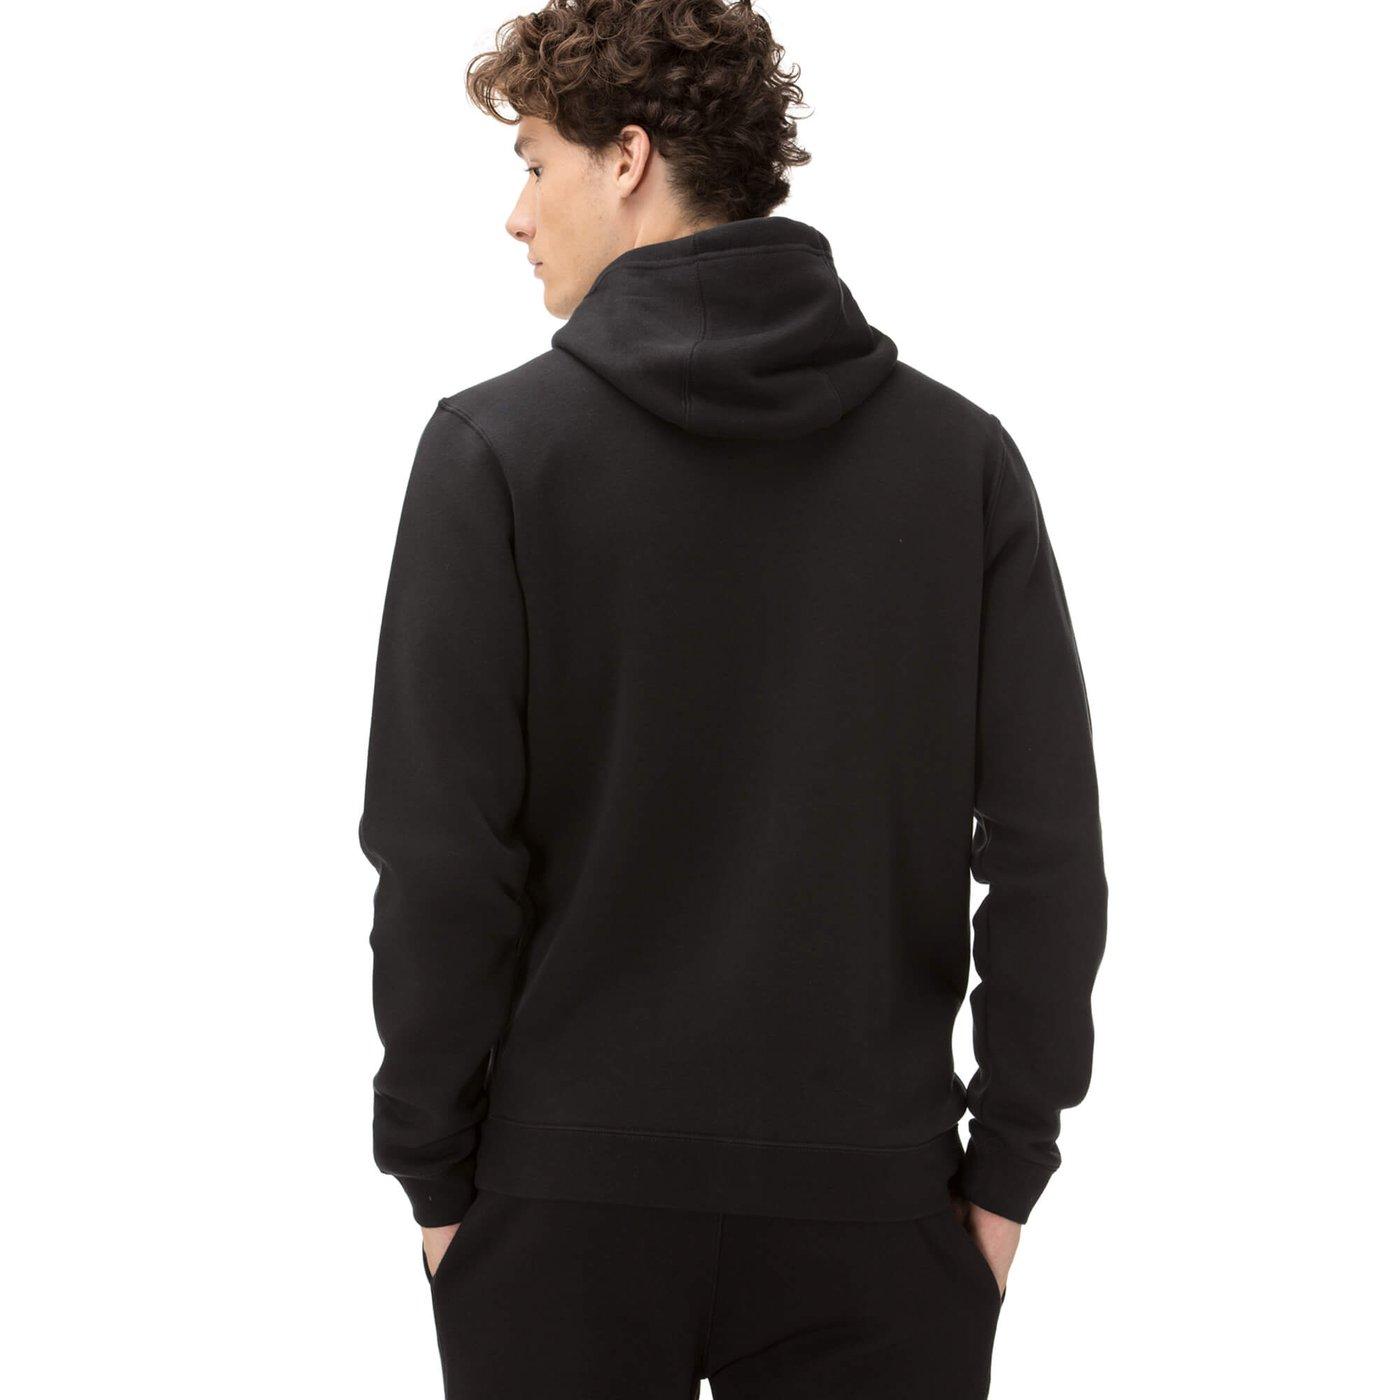 Nike Erkek Siyah Fermuarlı Sweatshirt